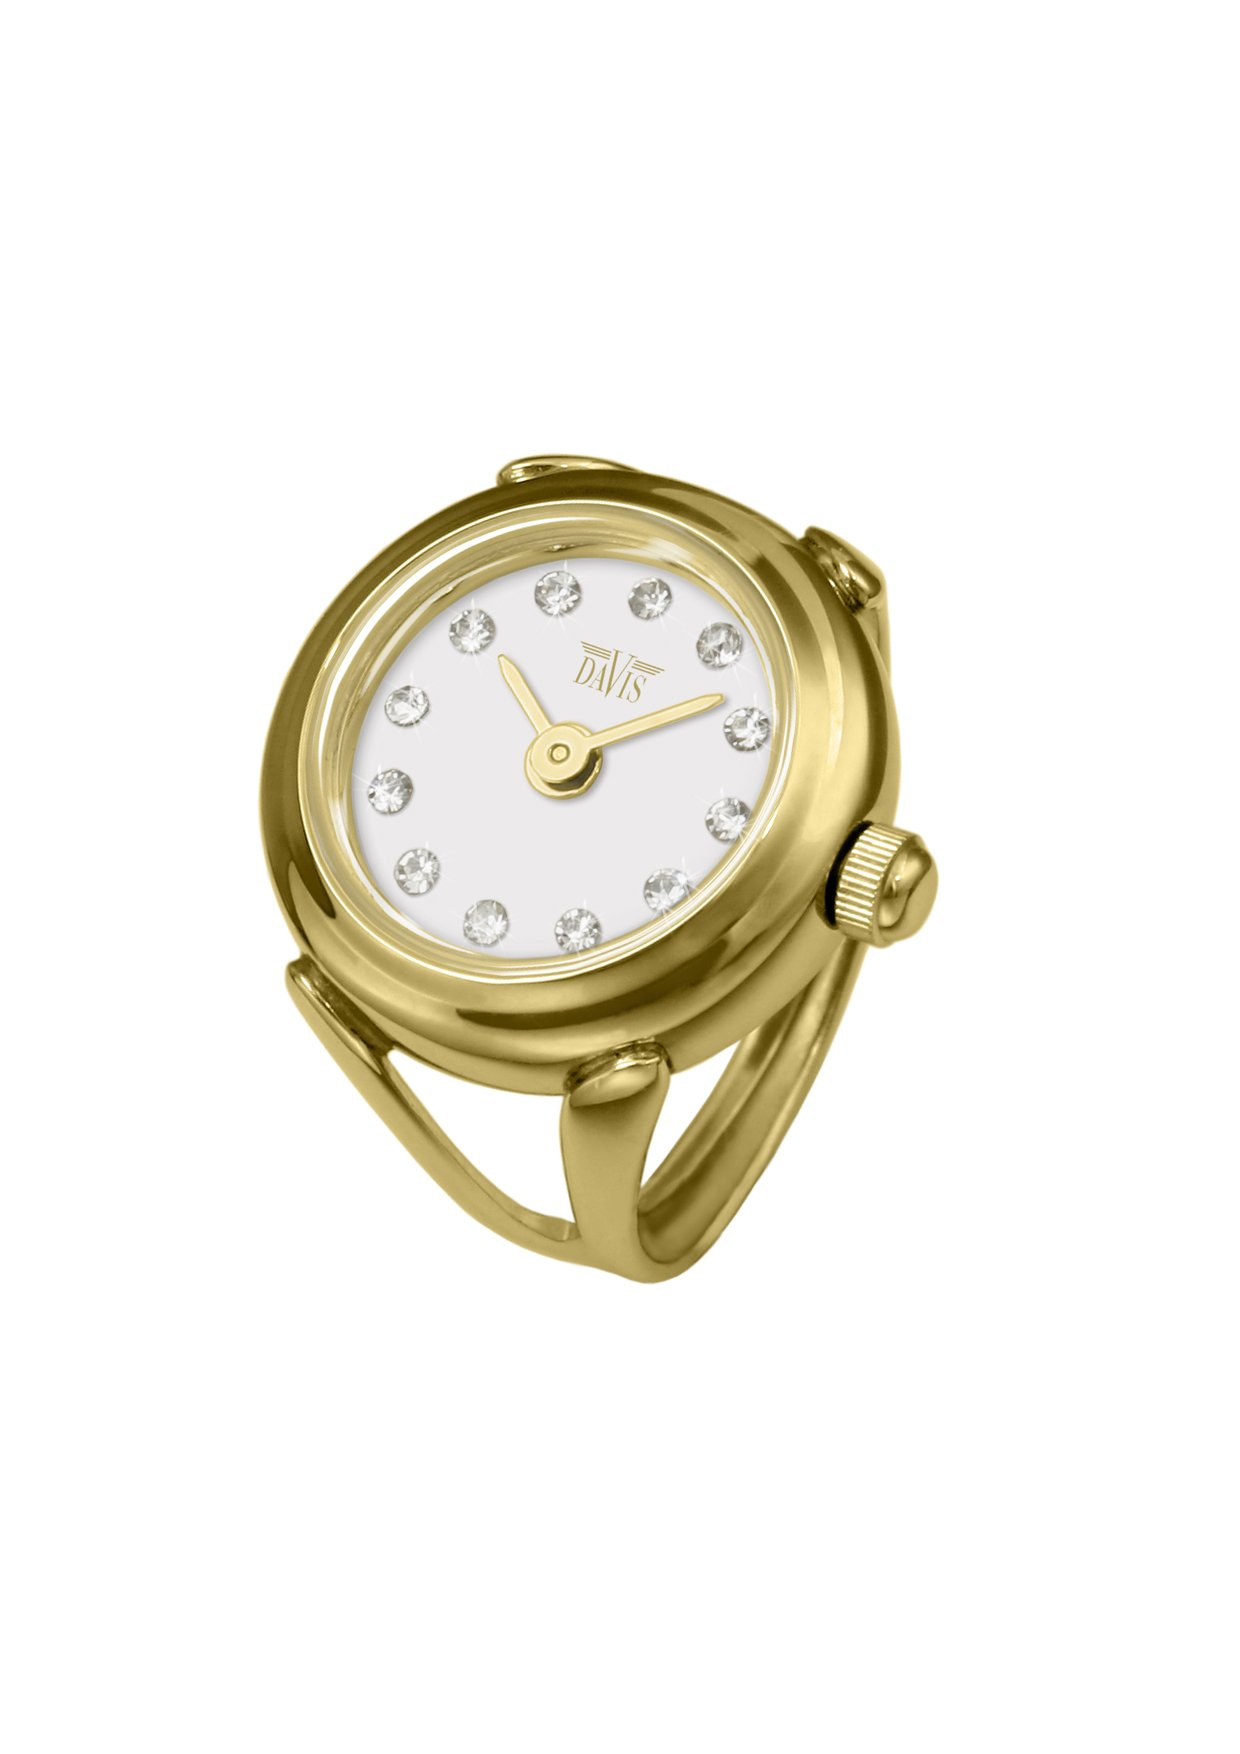 Davis 4174 - Womens Finger Ring Watch Yellow Gold White Dial Swarovski Crystal Rhinestones Sapphire Glass Adjustable